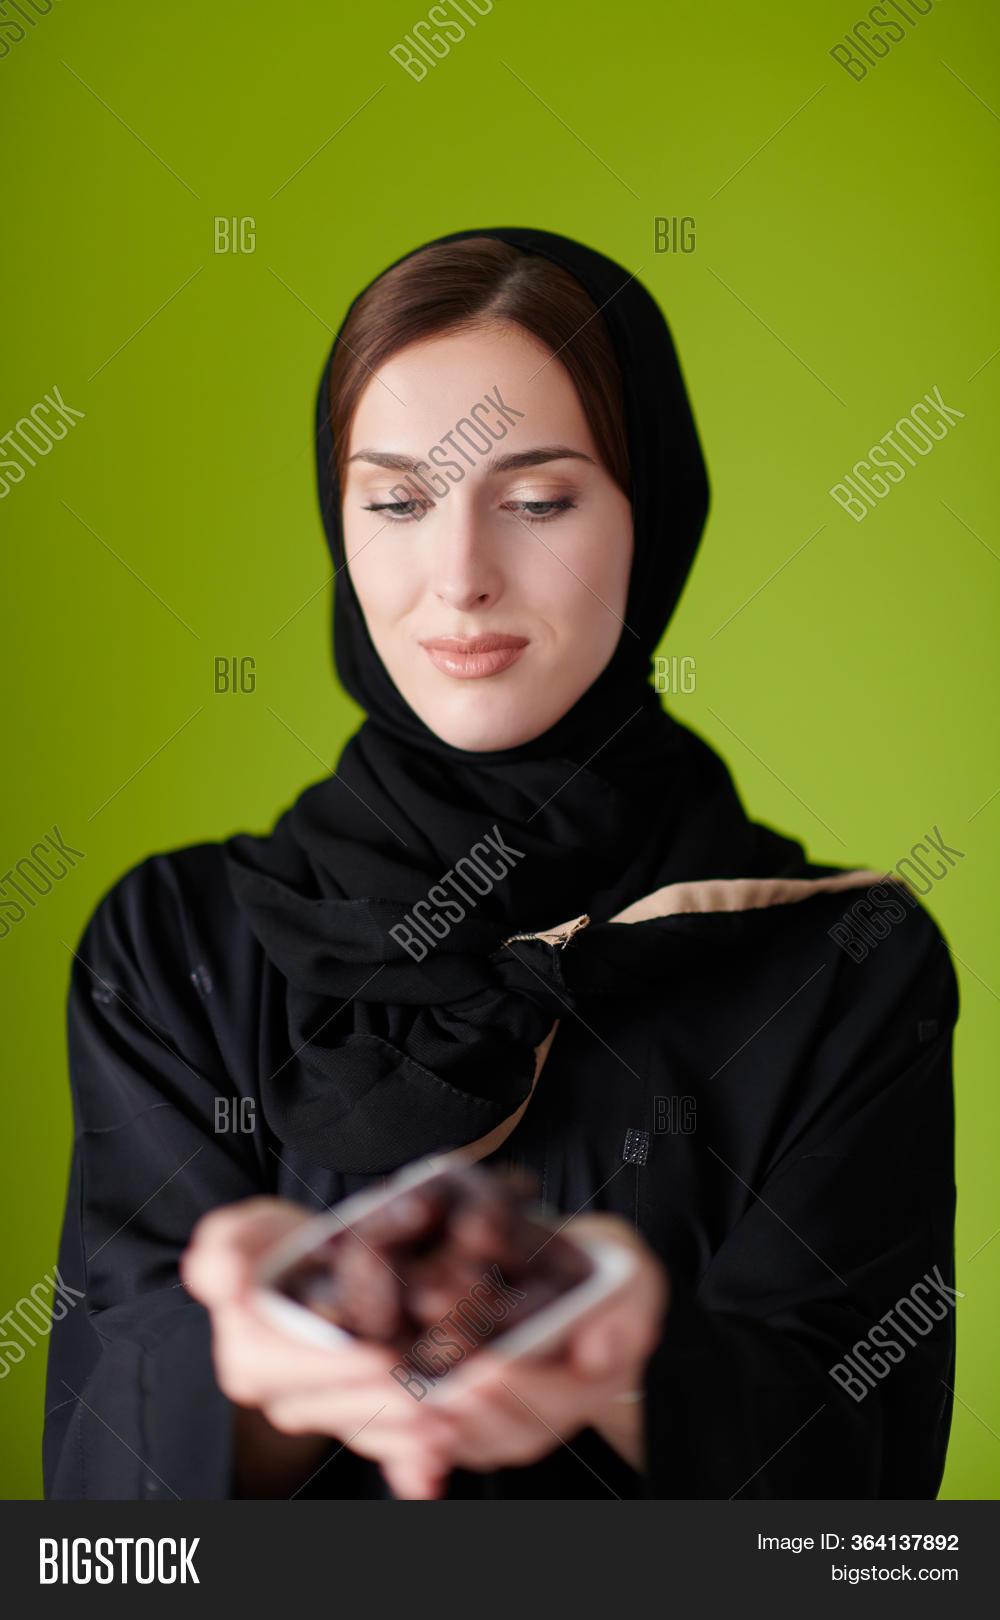 Free dating muslim women